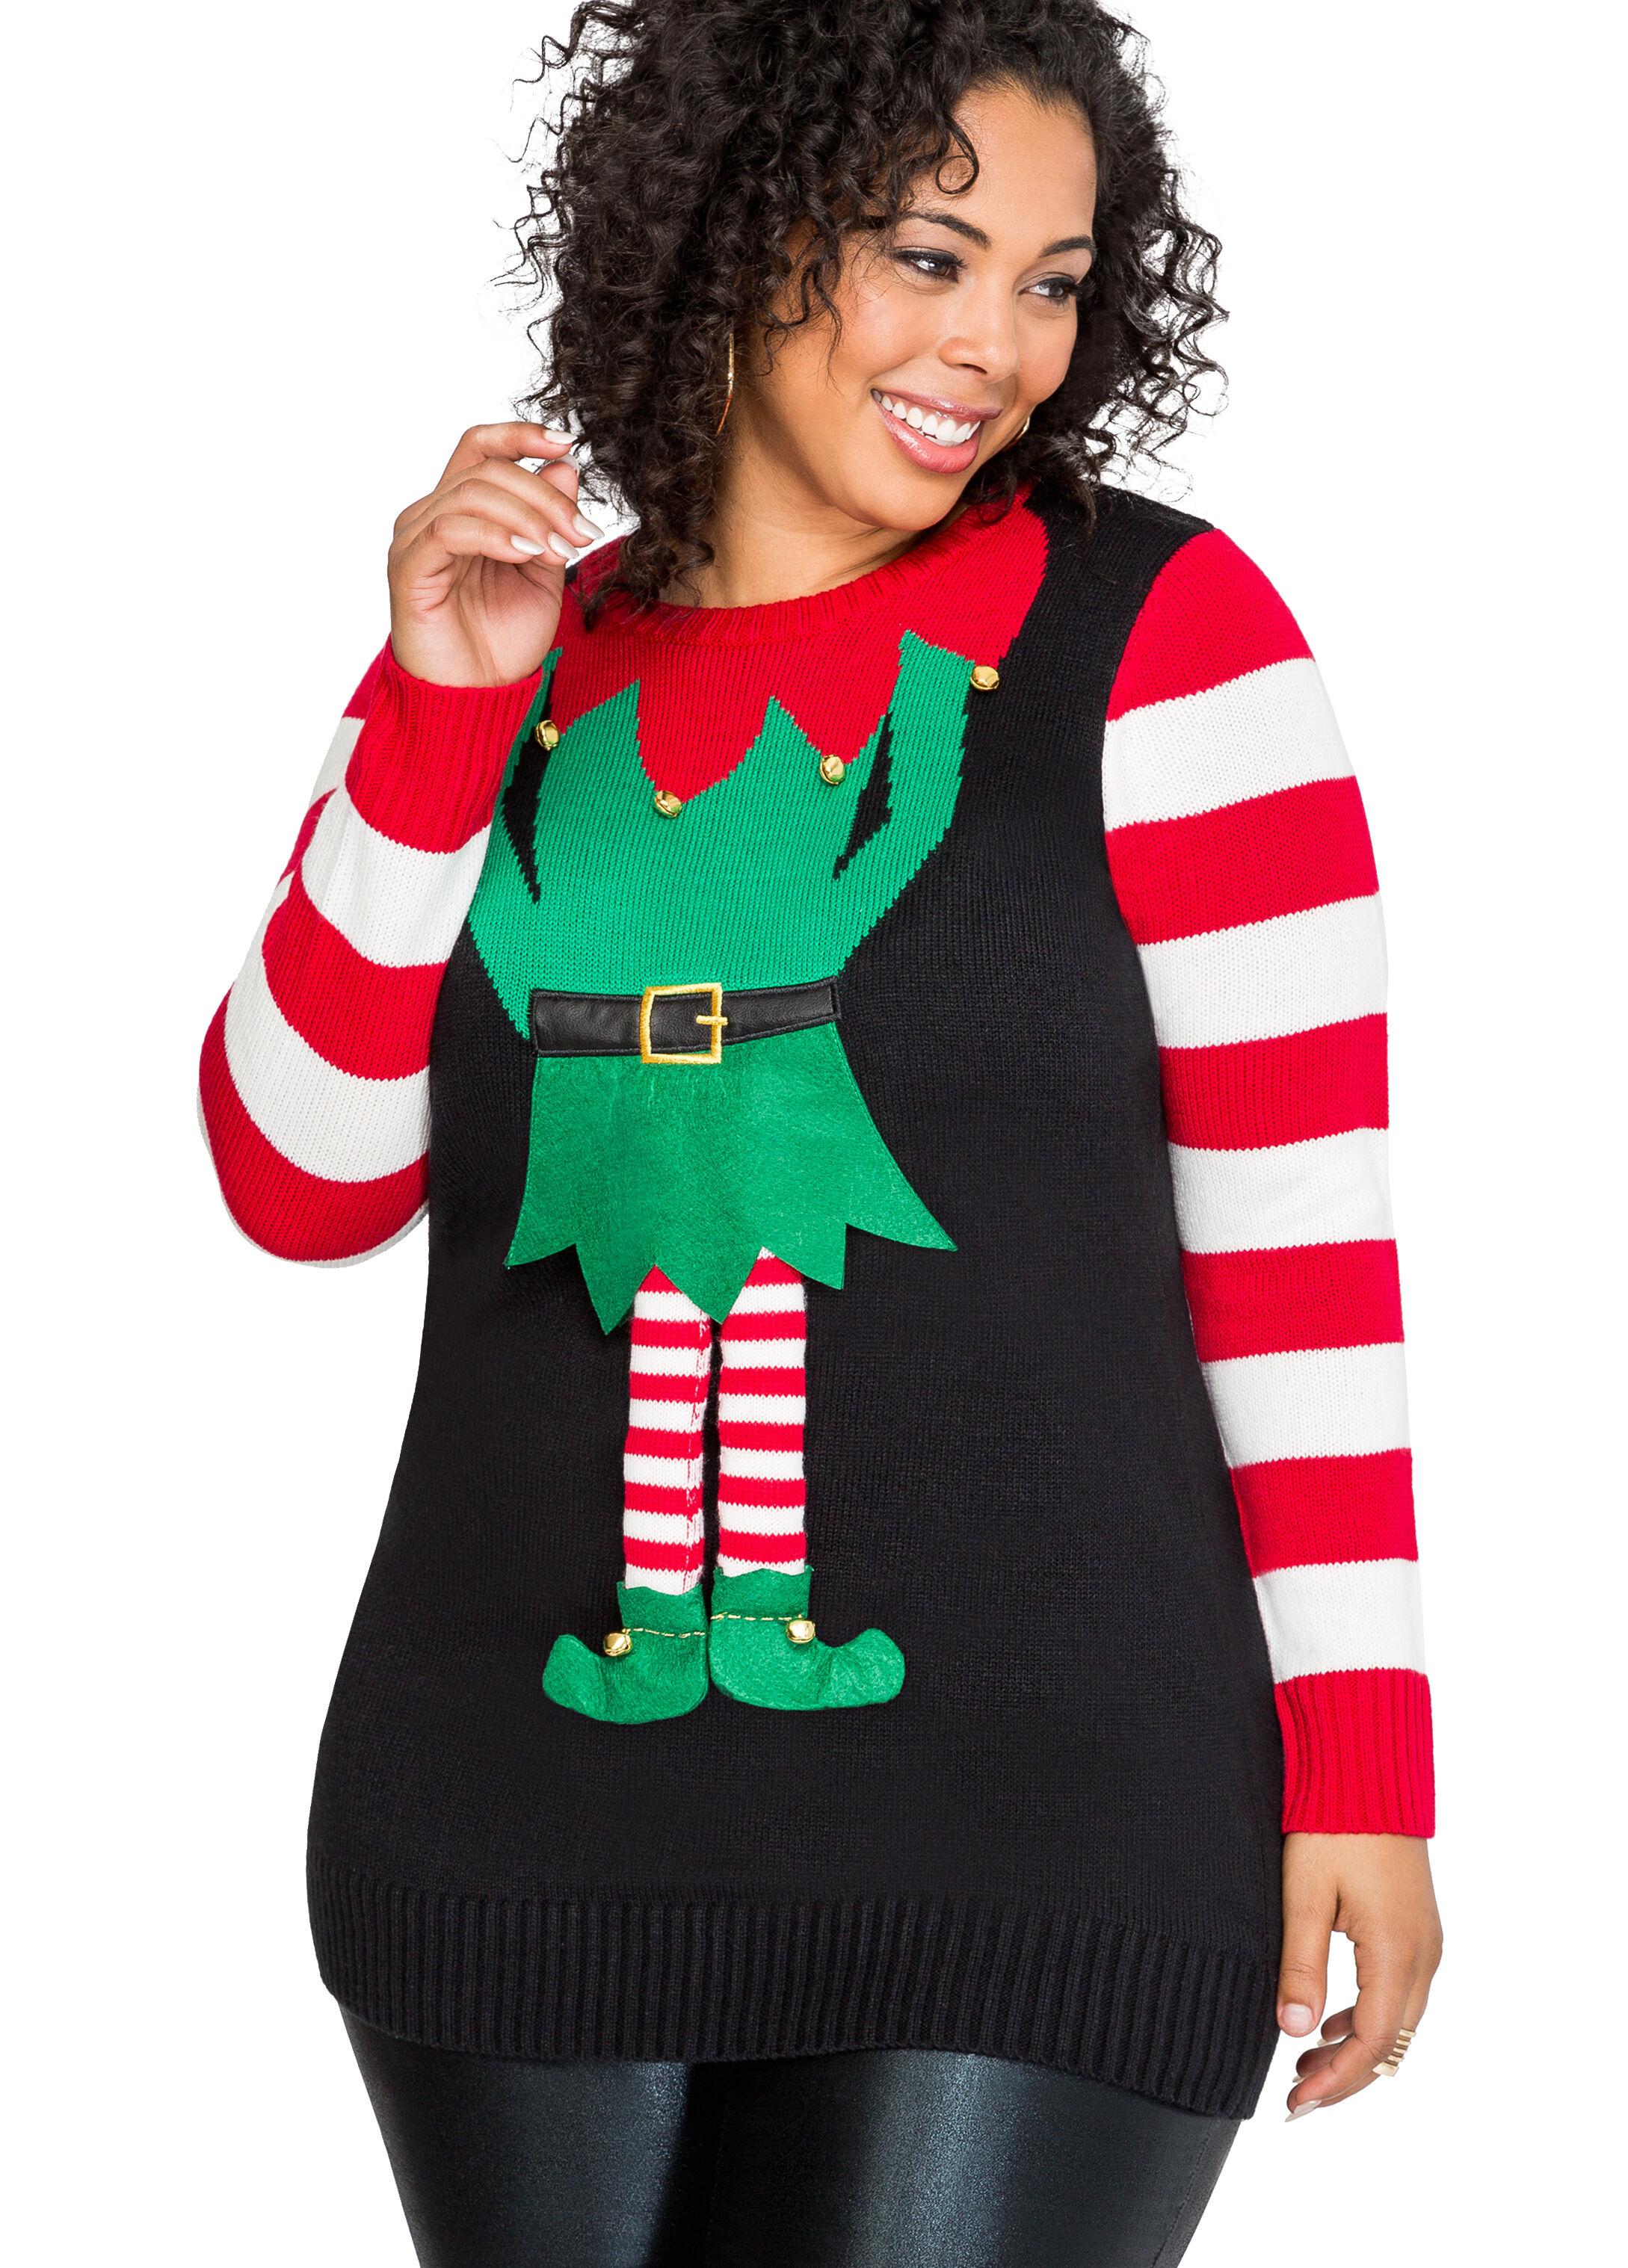 Jingle Bells Elf Holiday Sweater